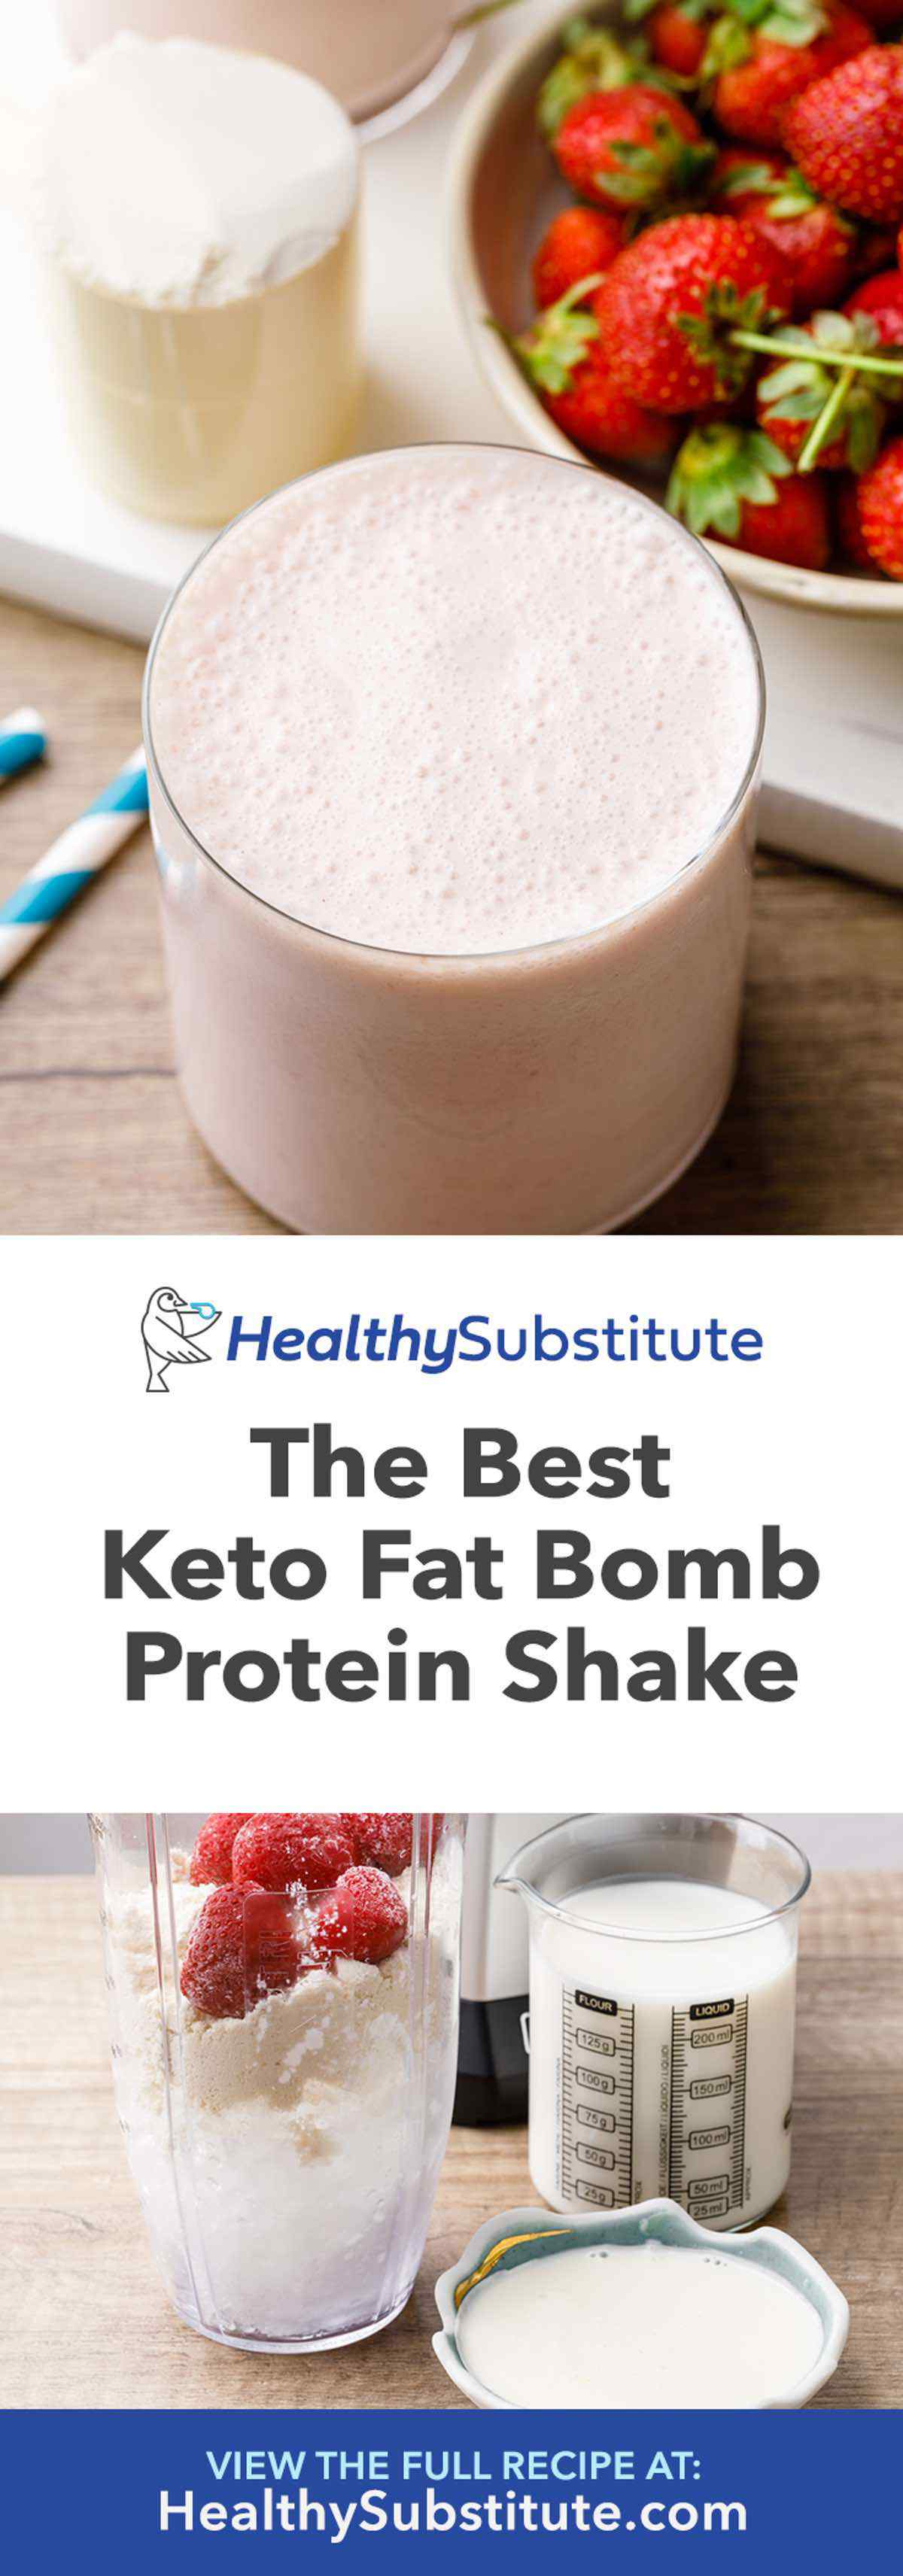 Keto Fat Bomb Protein Shake